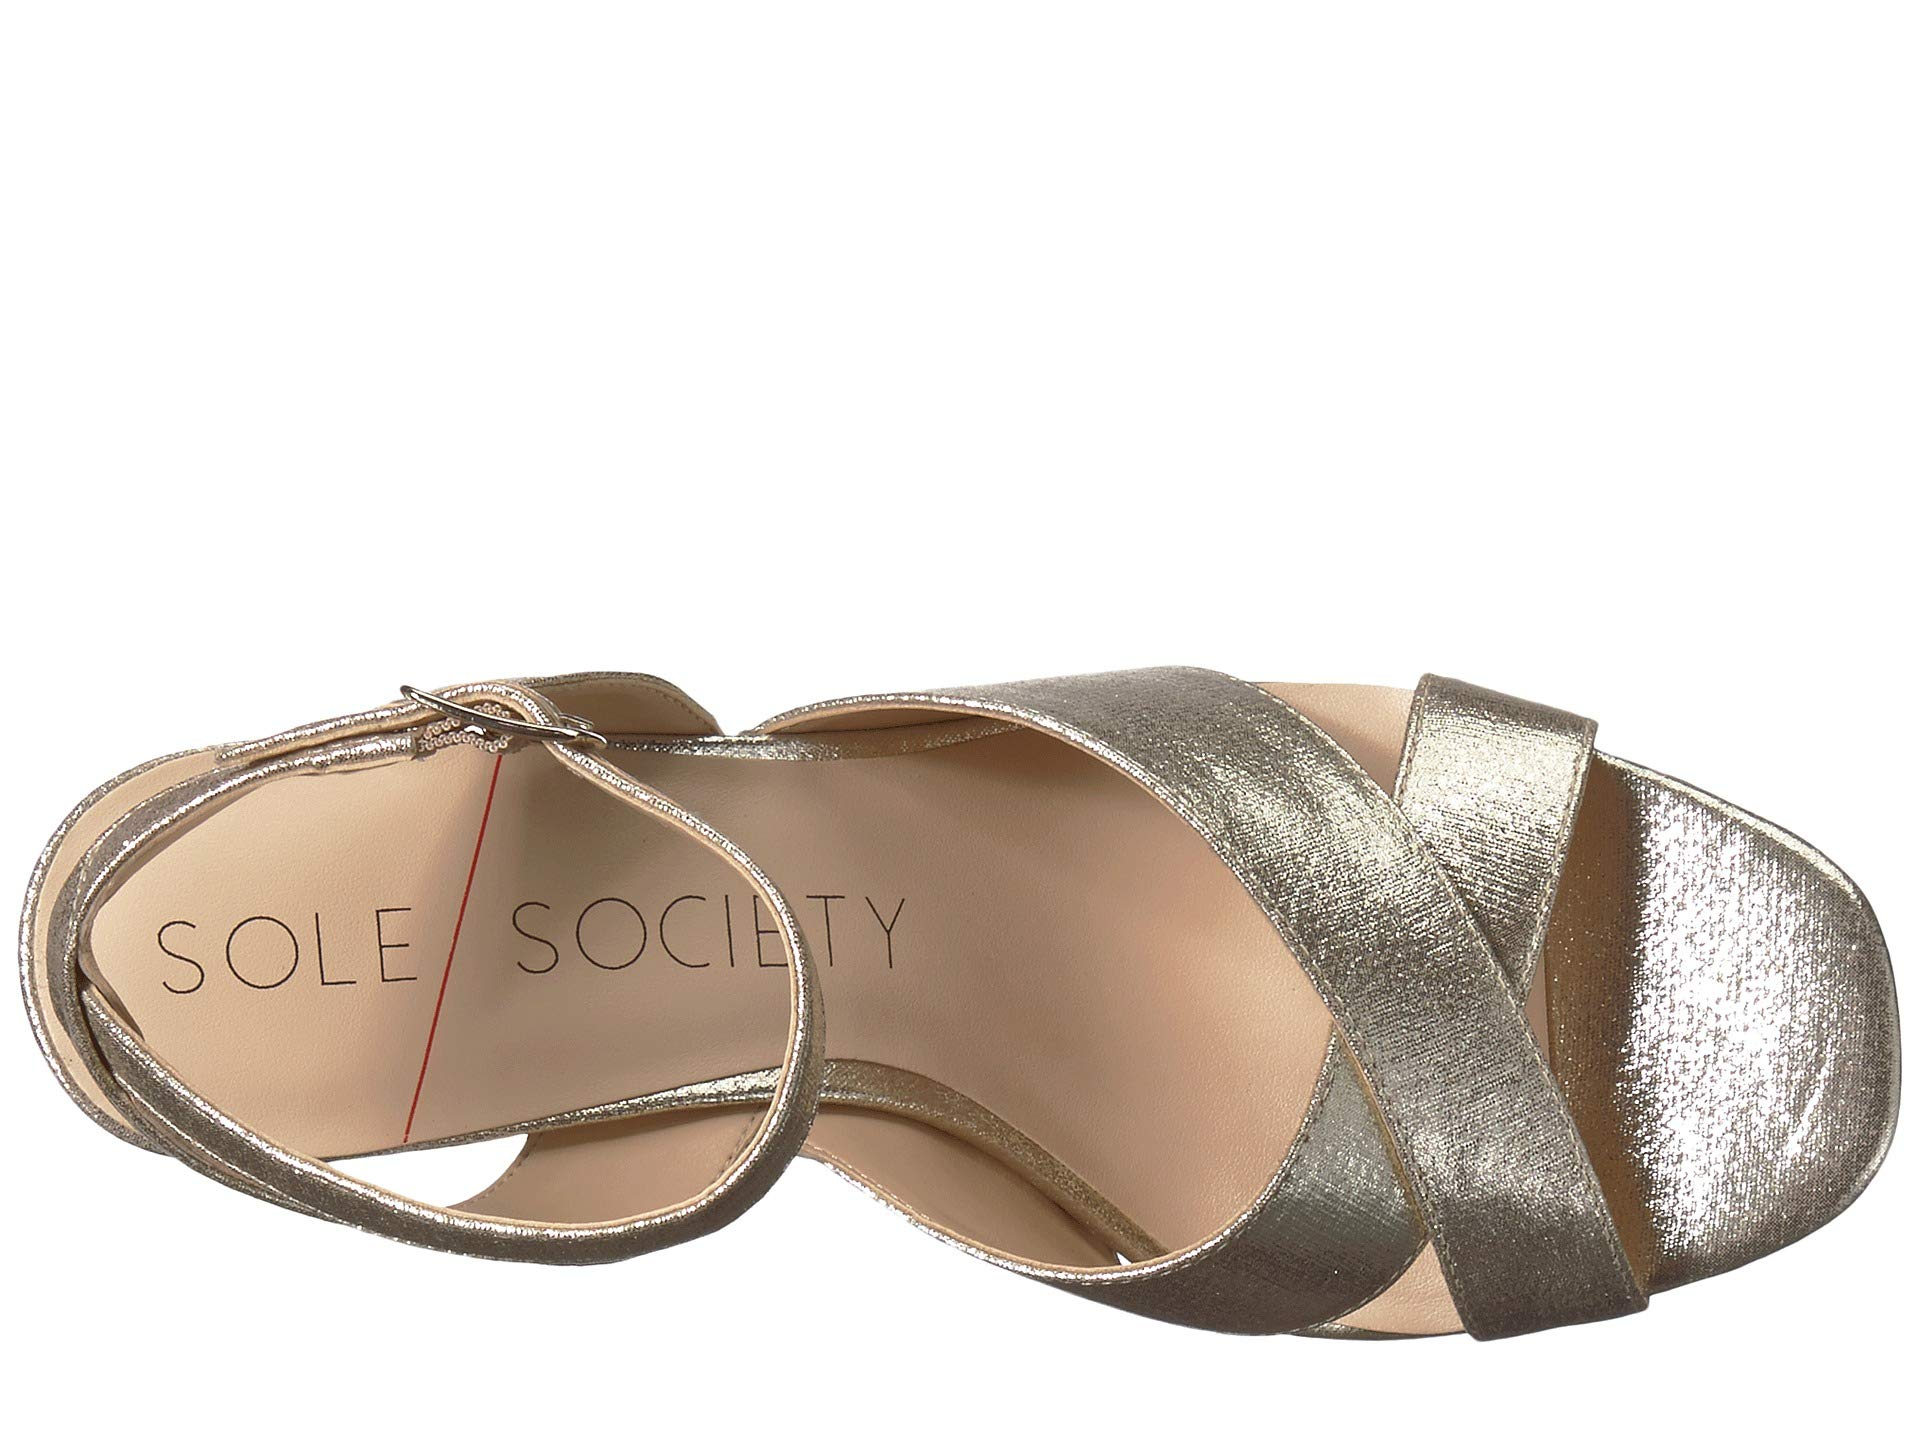 Pu Odyssey Champagne Sole Society Gold Cassidea xqwgnIXTF